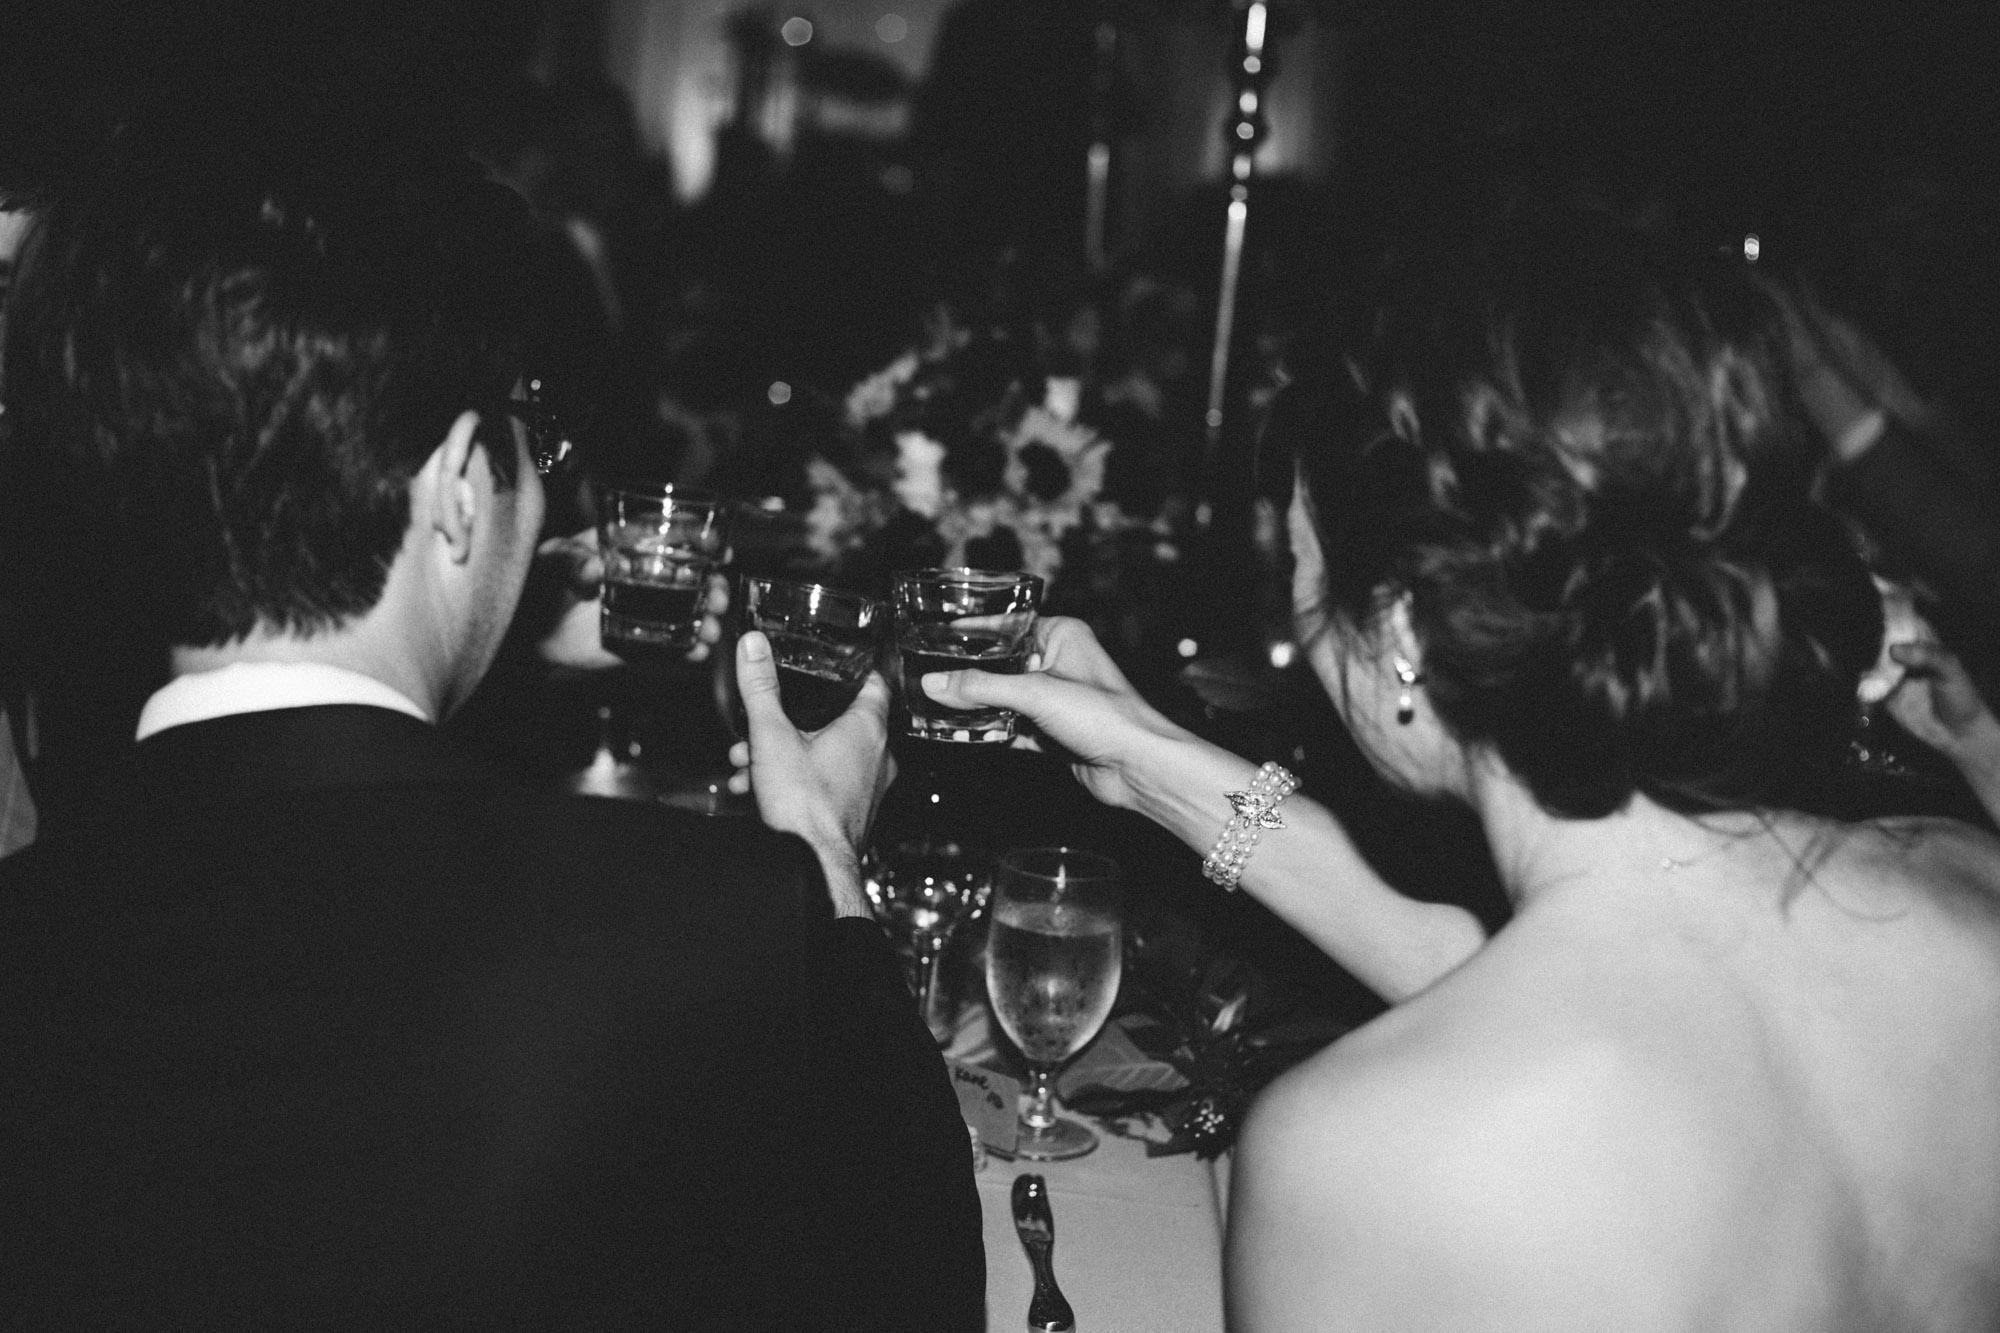 Norway Center wedding reception at Grand View Lodge, photography by Britt DeZeeuw